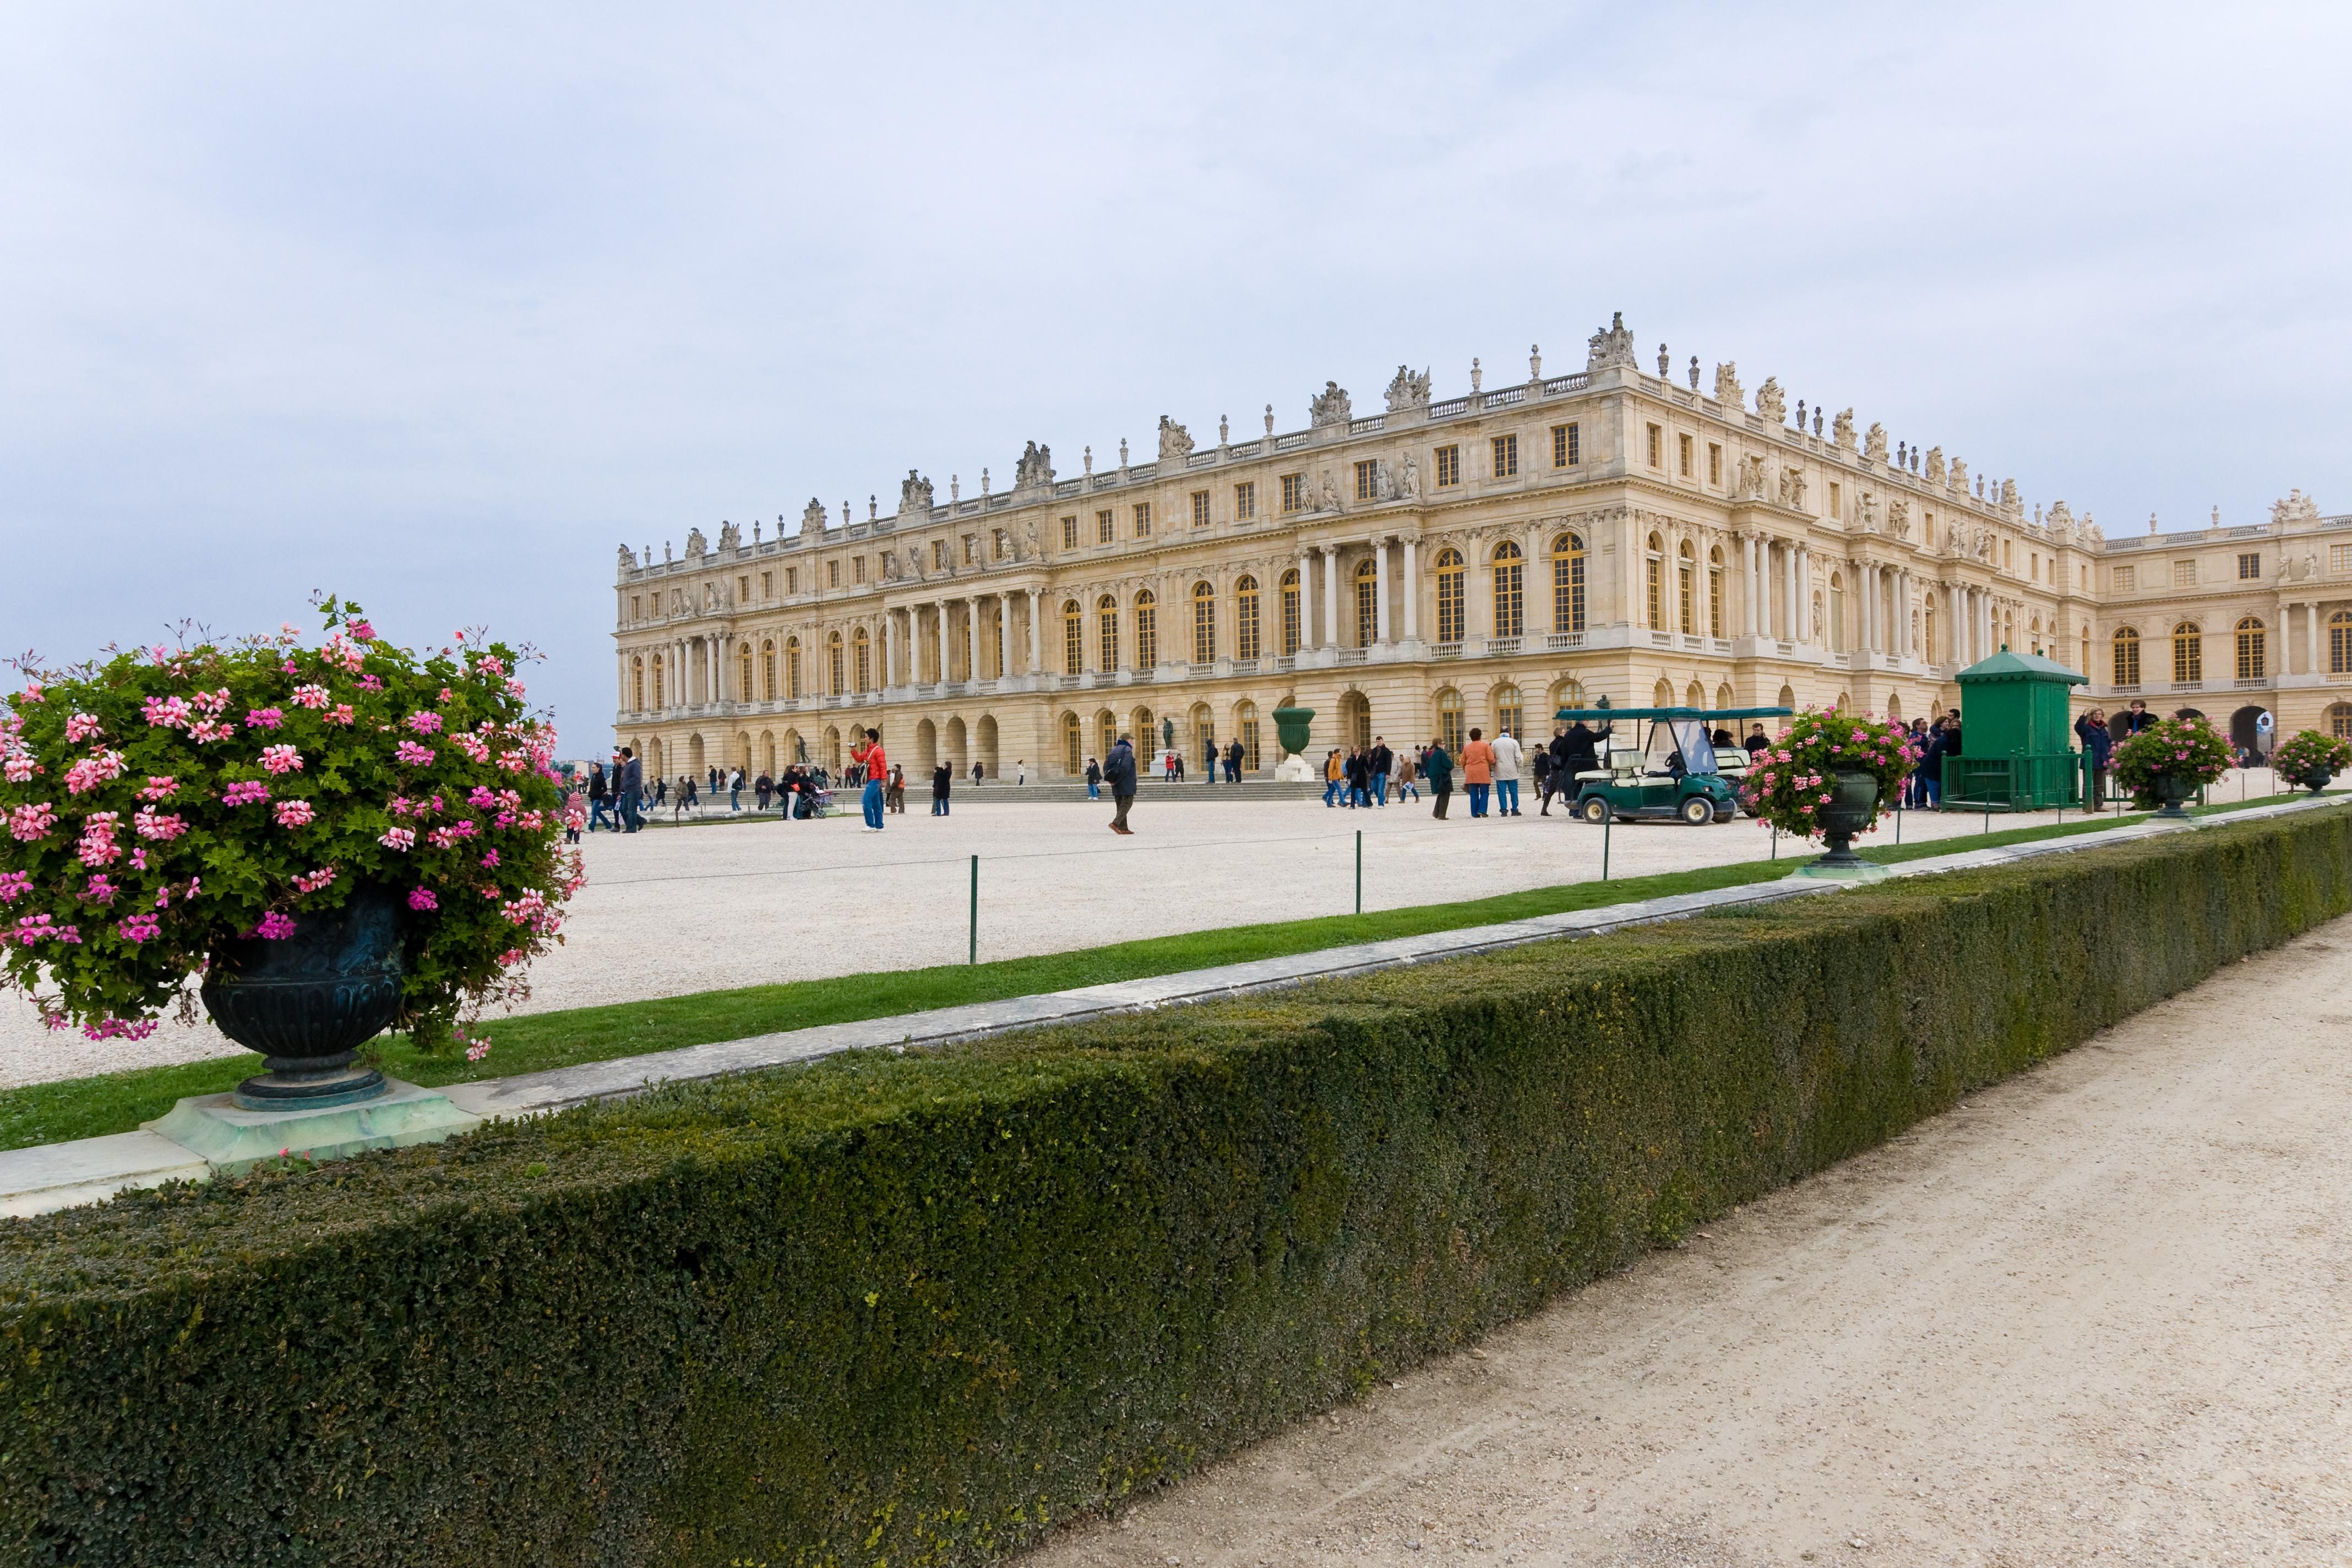 List of films shot at the palace of versailles - Photo chateau de versailles ...